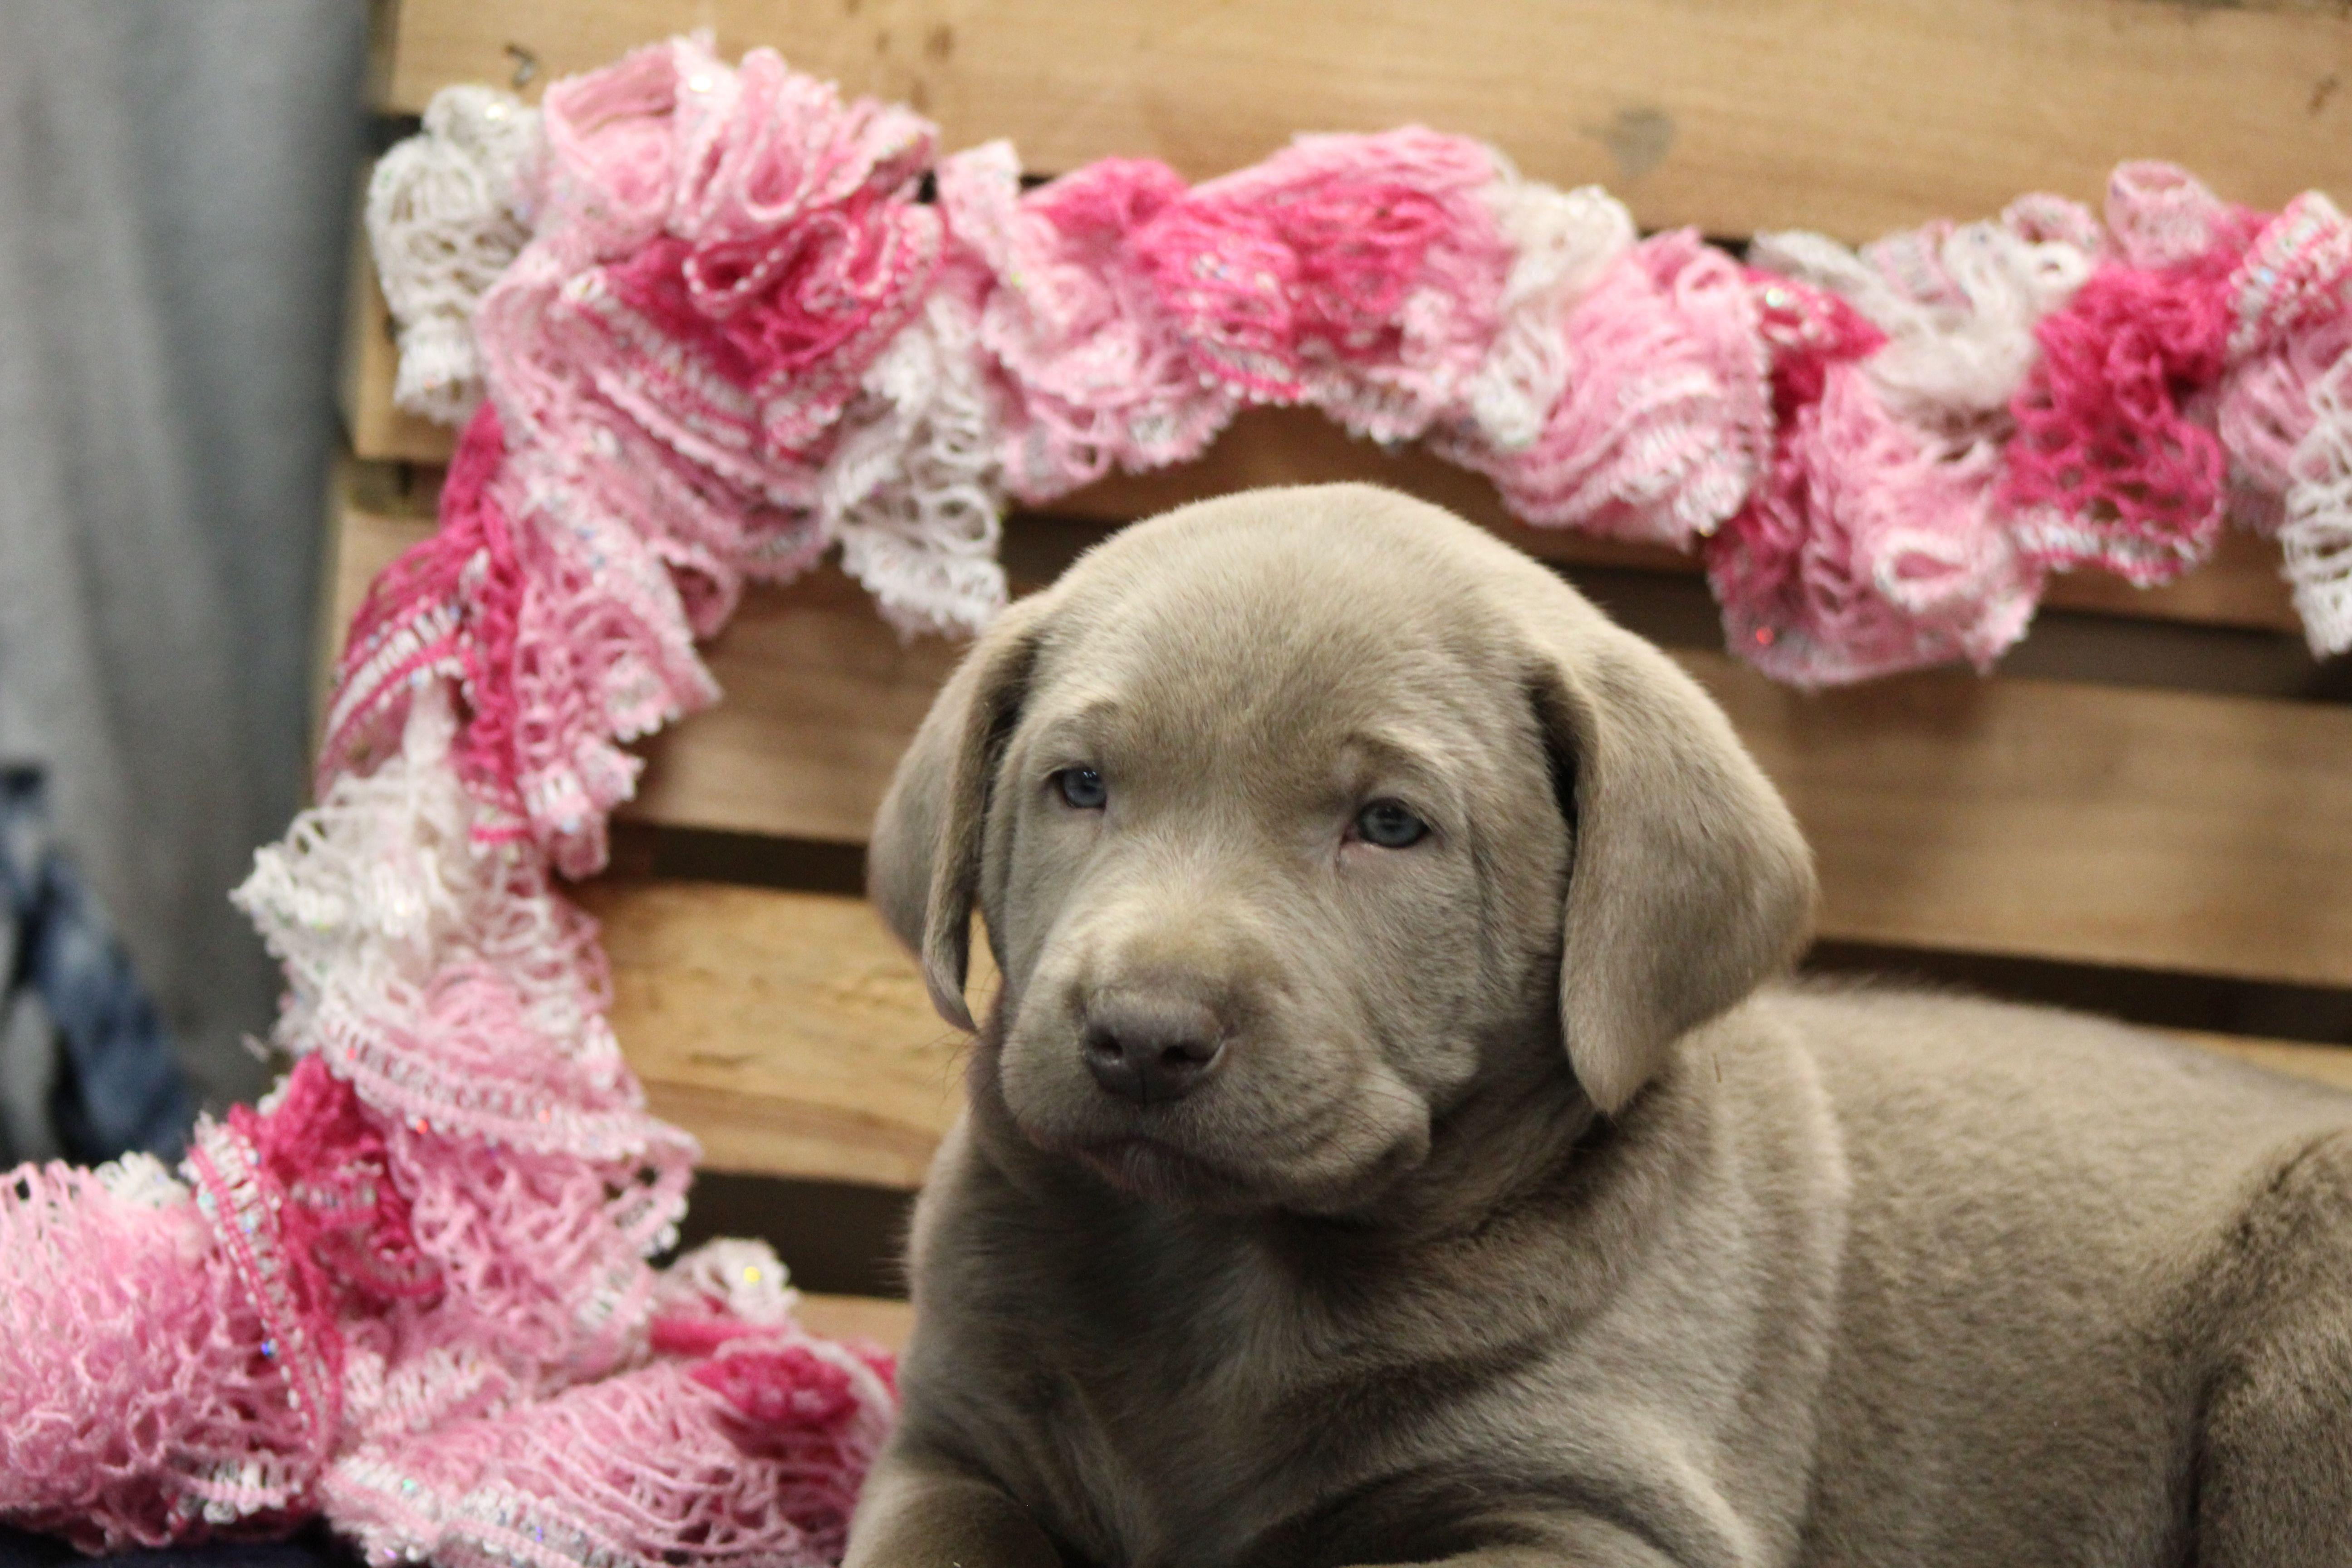 Kole Labrador Retriever doggie for sale at Goshen